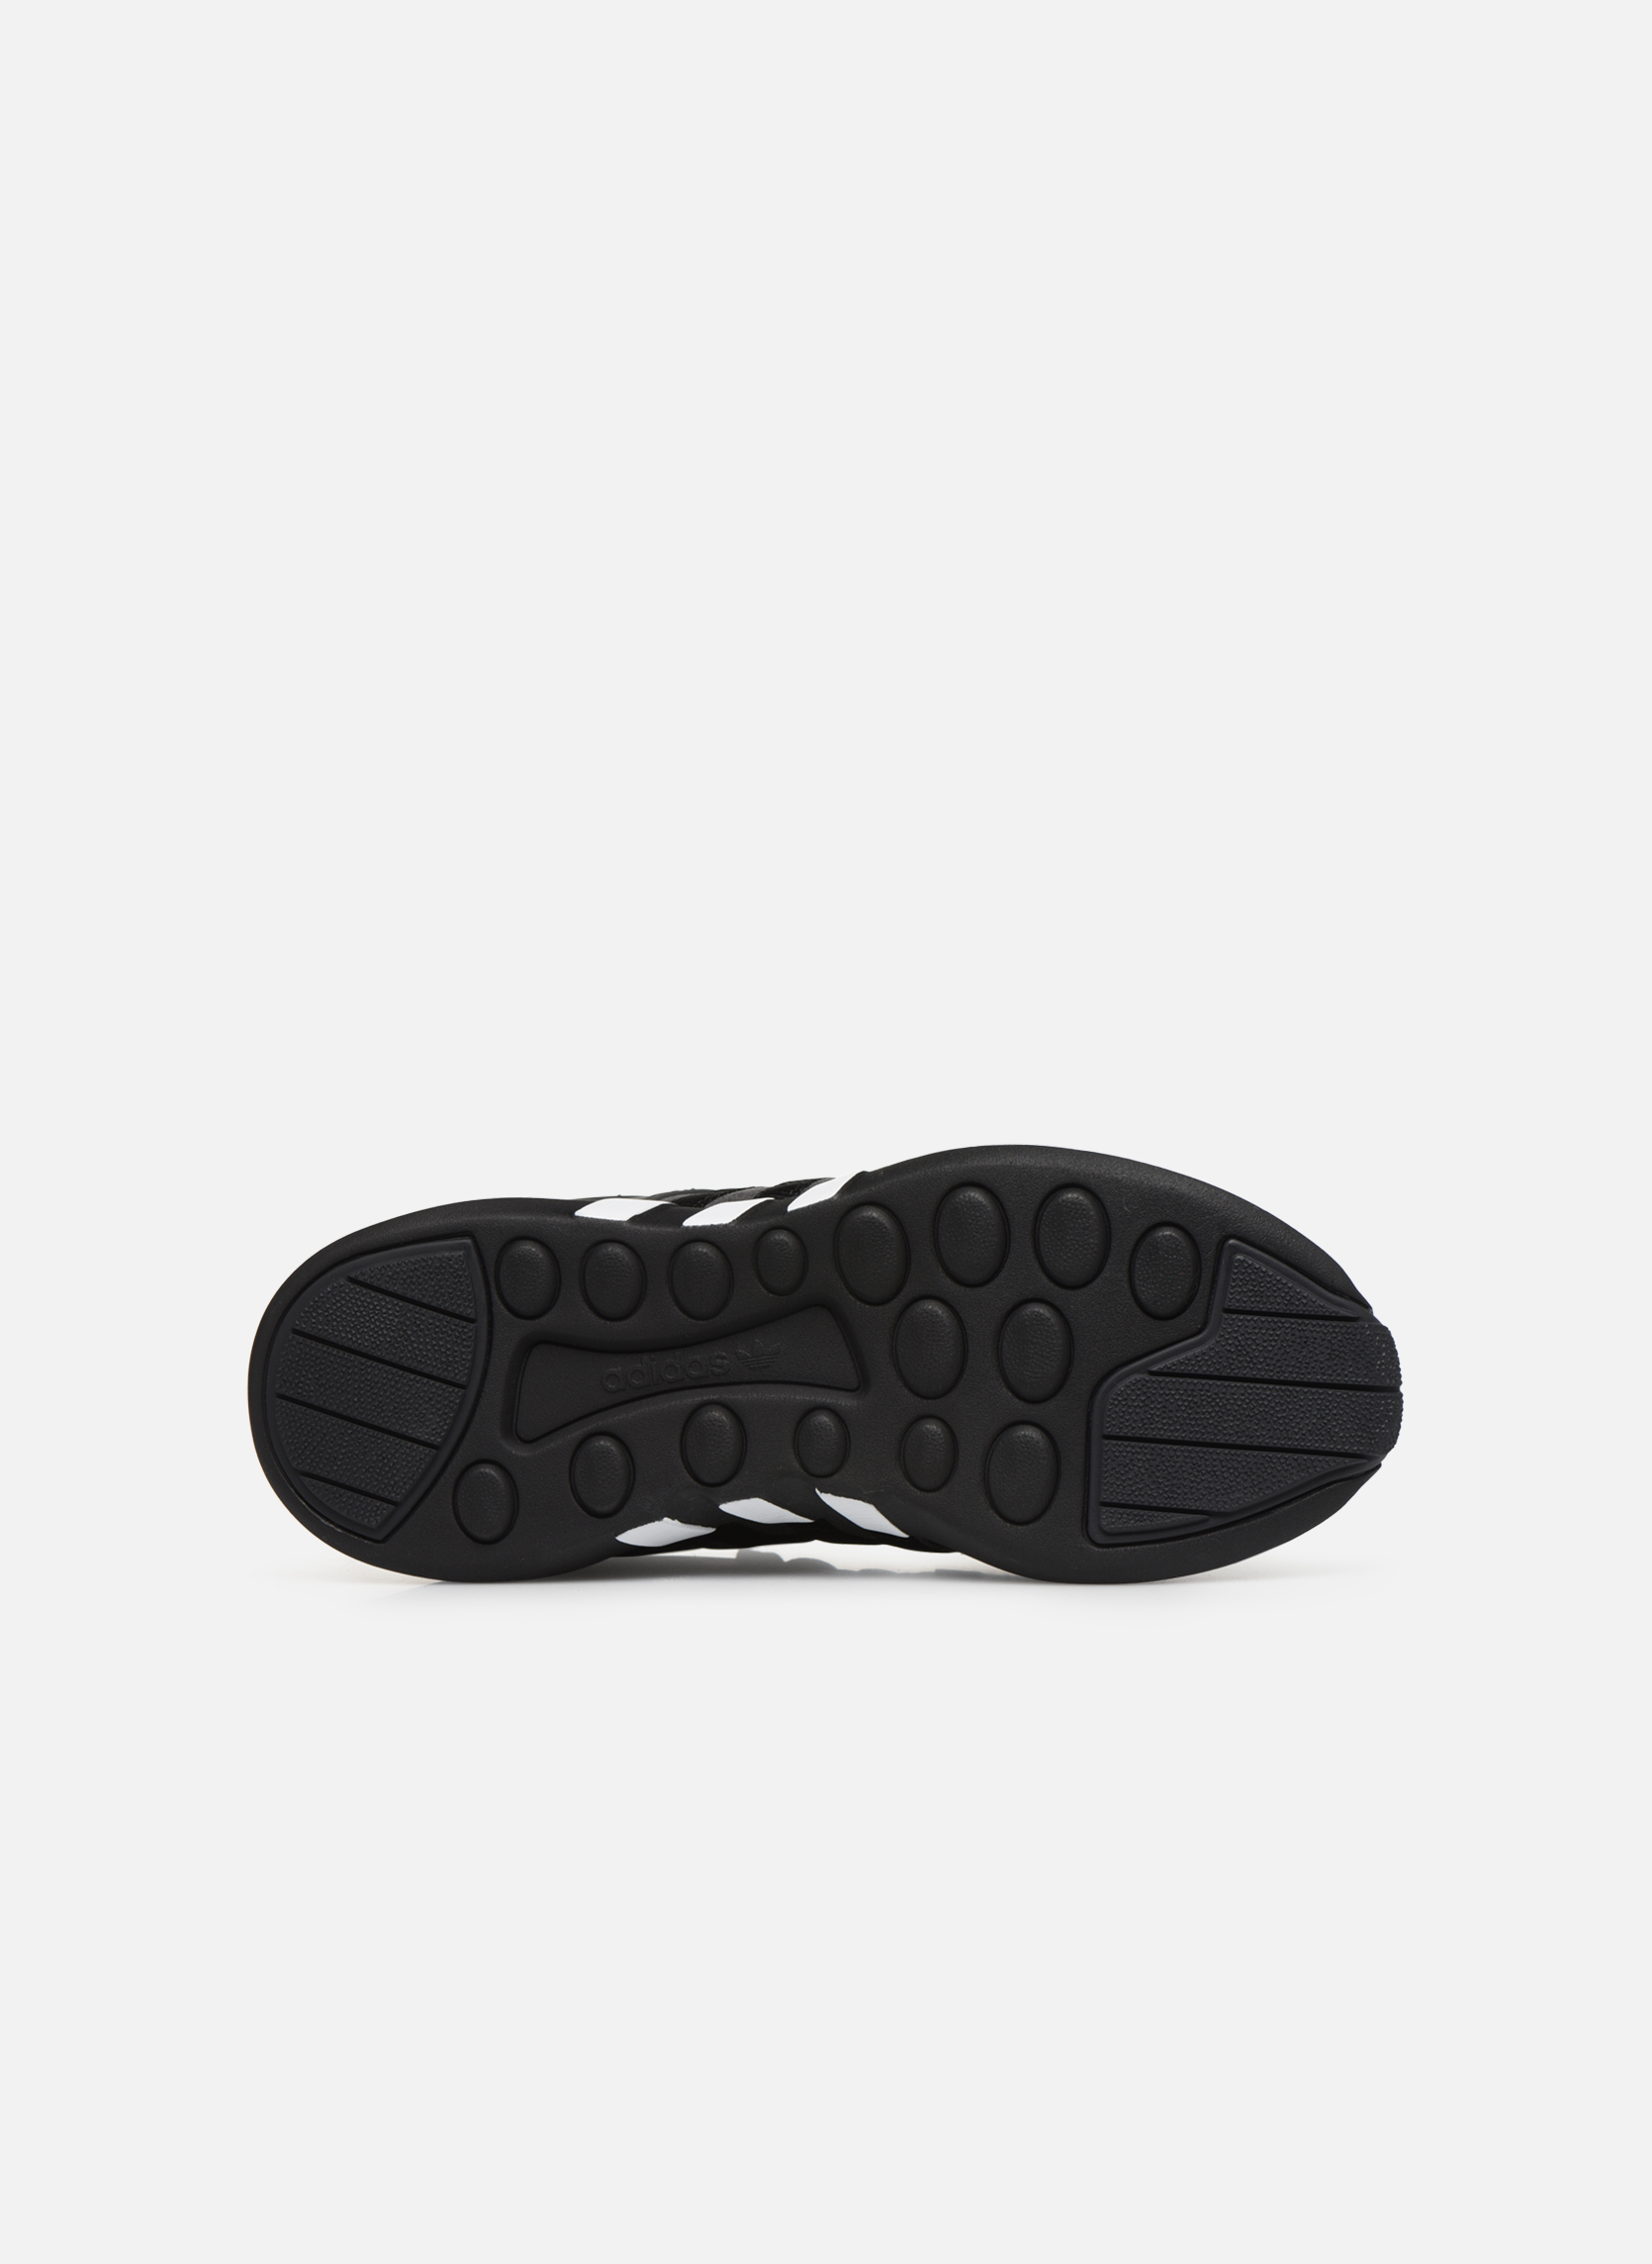 Noiess/Noiess/Souver Adidas Originals Eqt Support Adv (Noir)